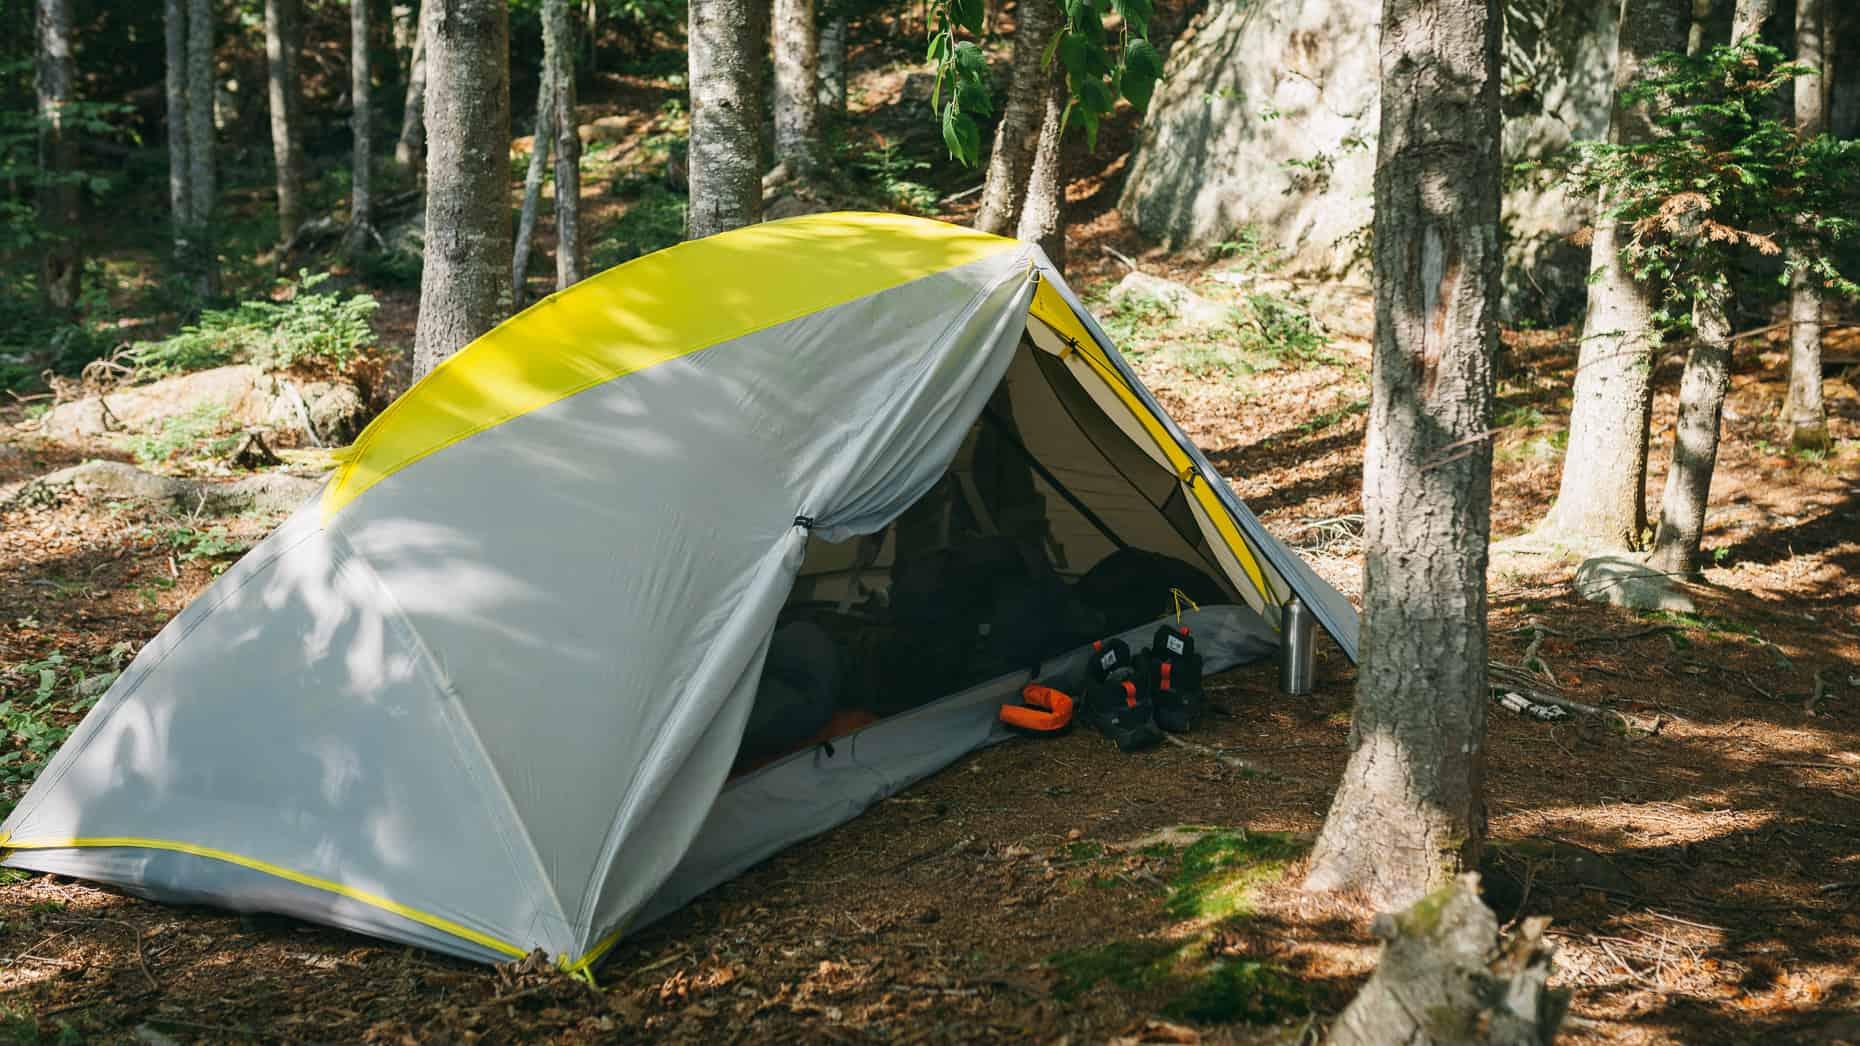 LL Bean Microlight tent.